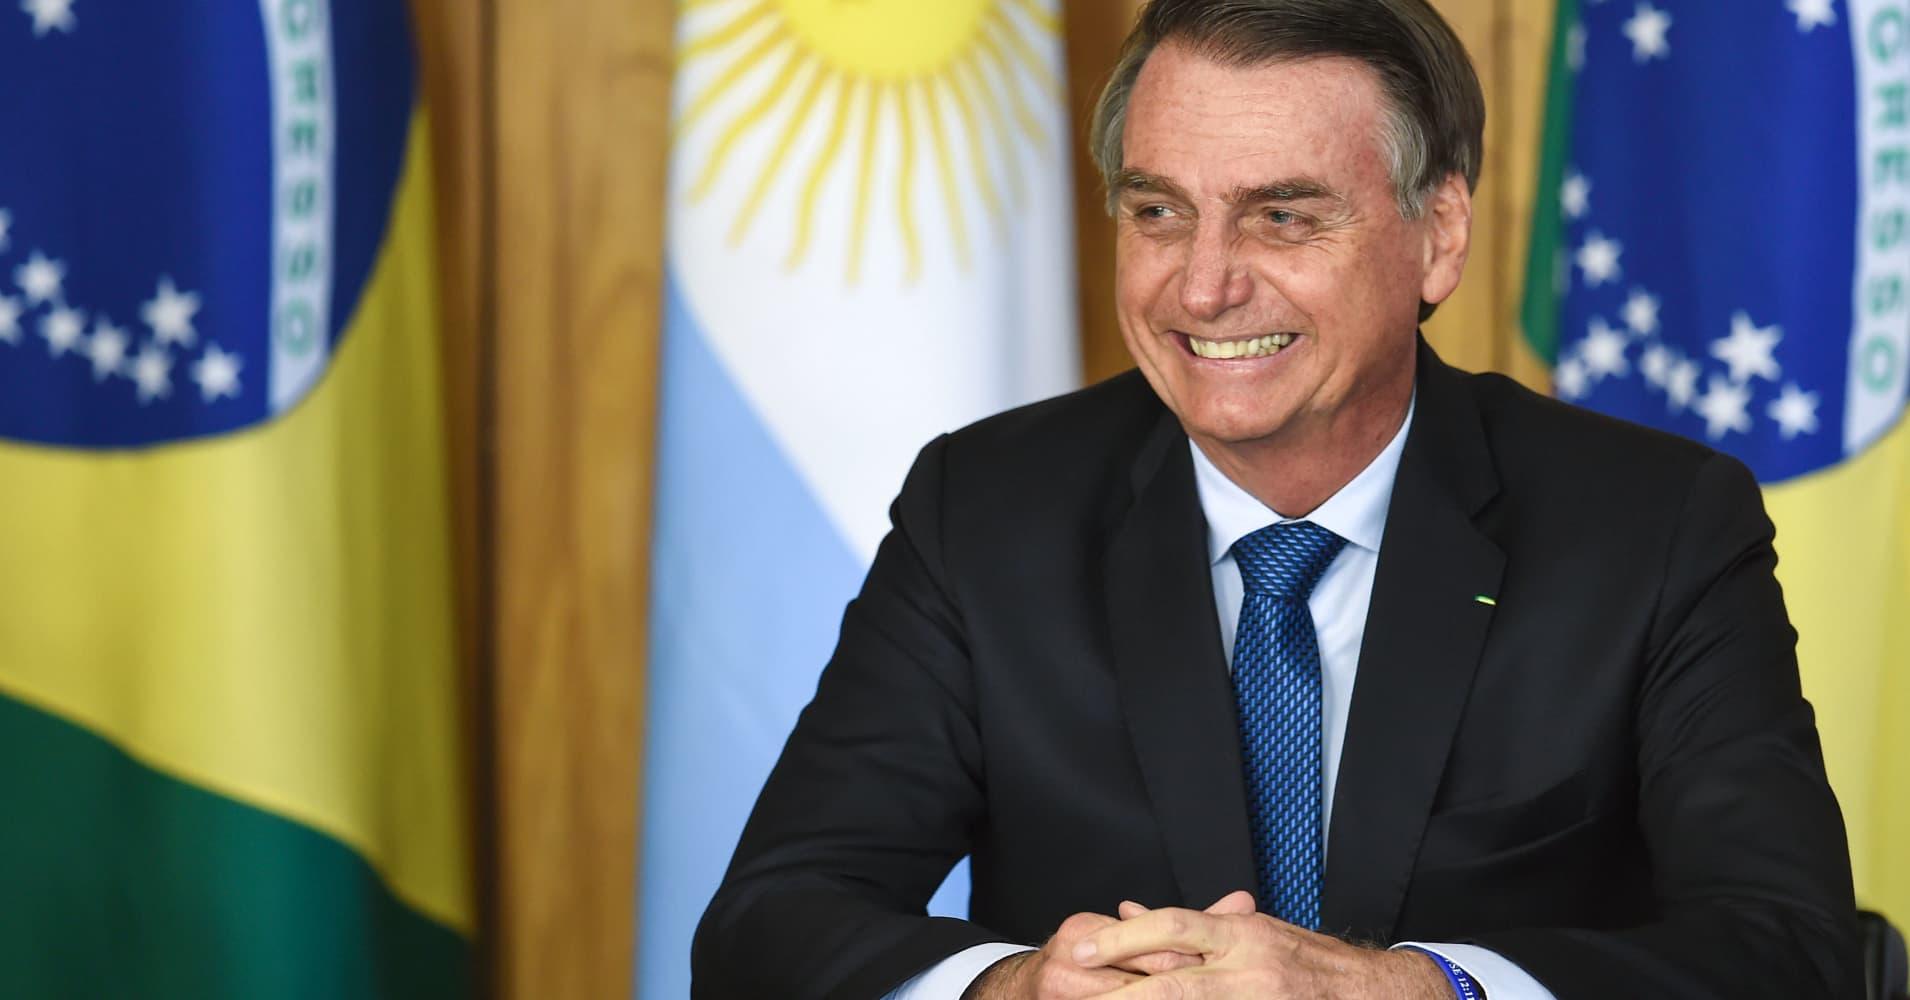 Bolsonaro's pro-market agenda faces its first test of confidence as Brazil's Congress returns